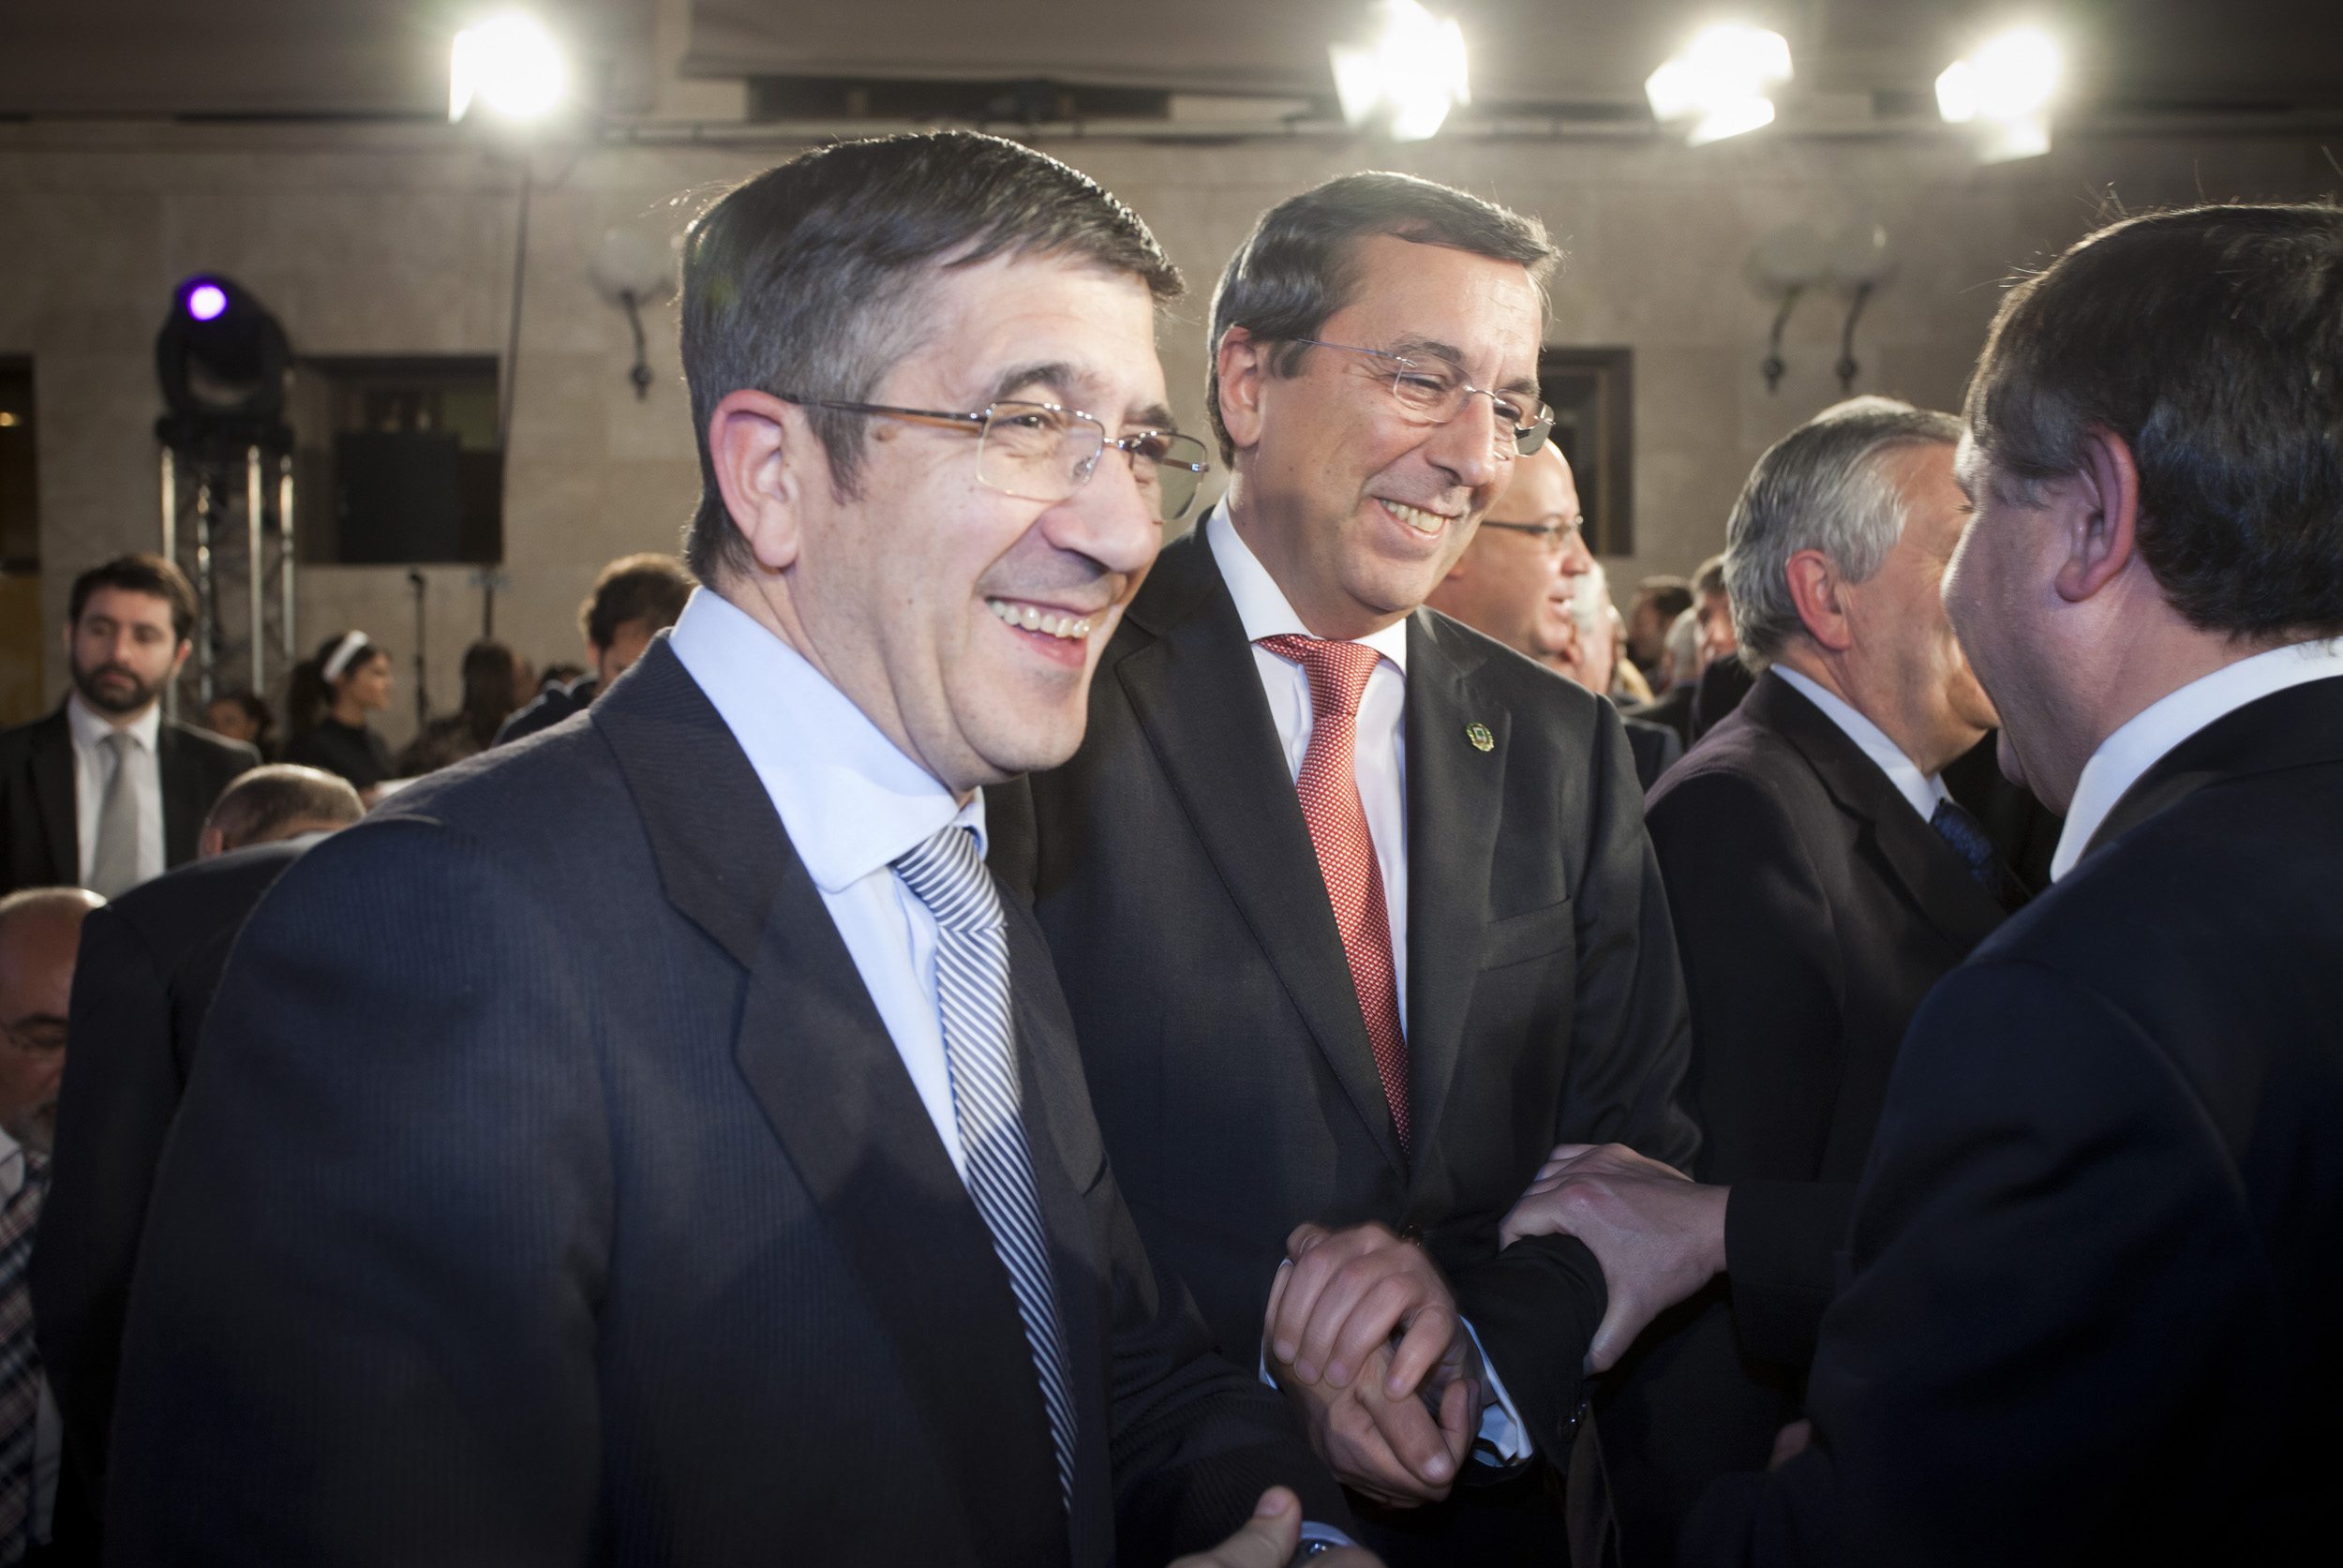 sociedad_vasca20.jpg